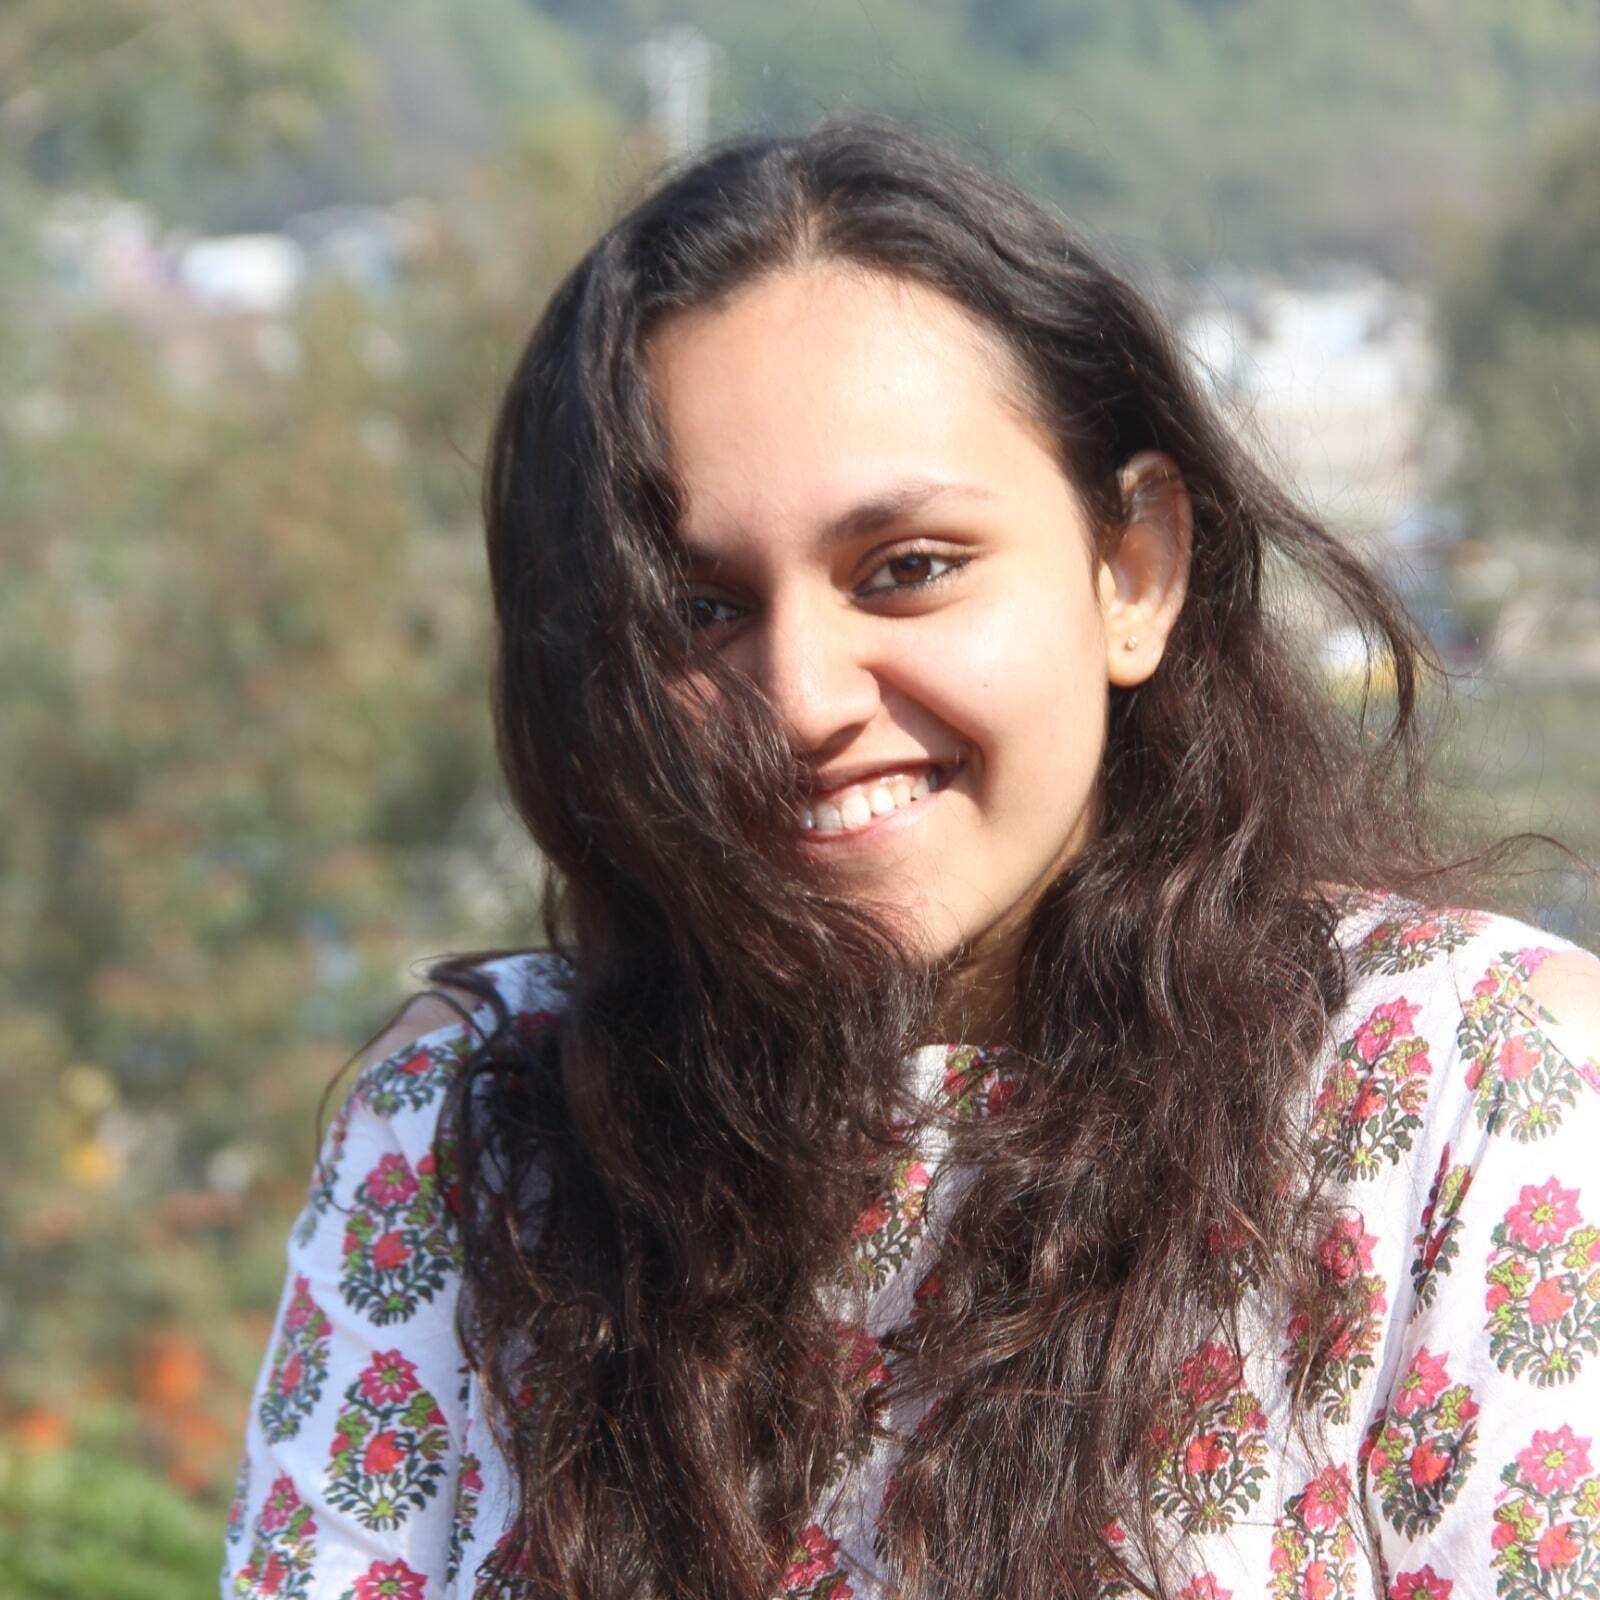 Meeha Tewari